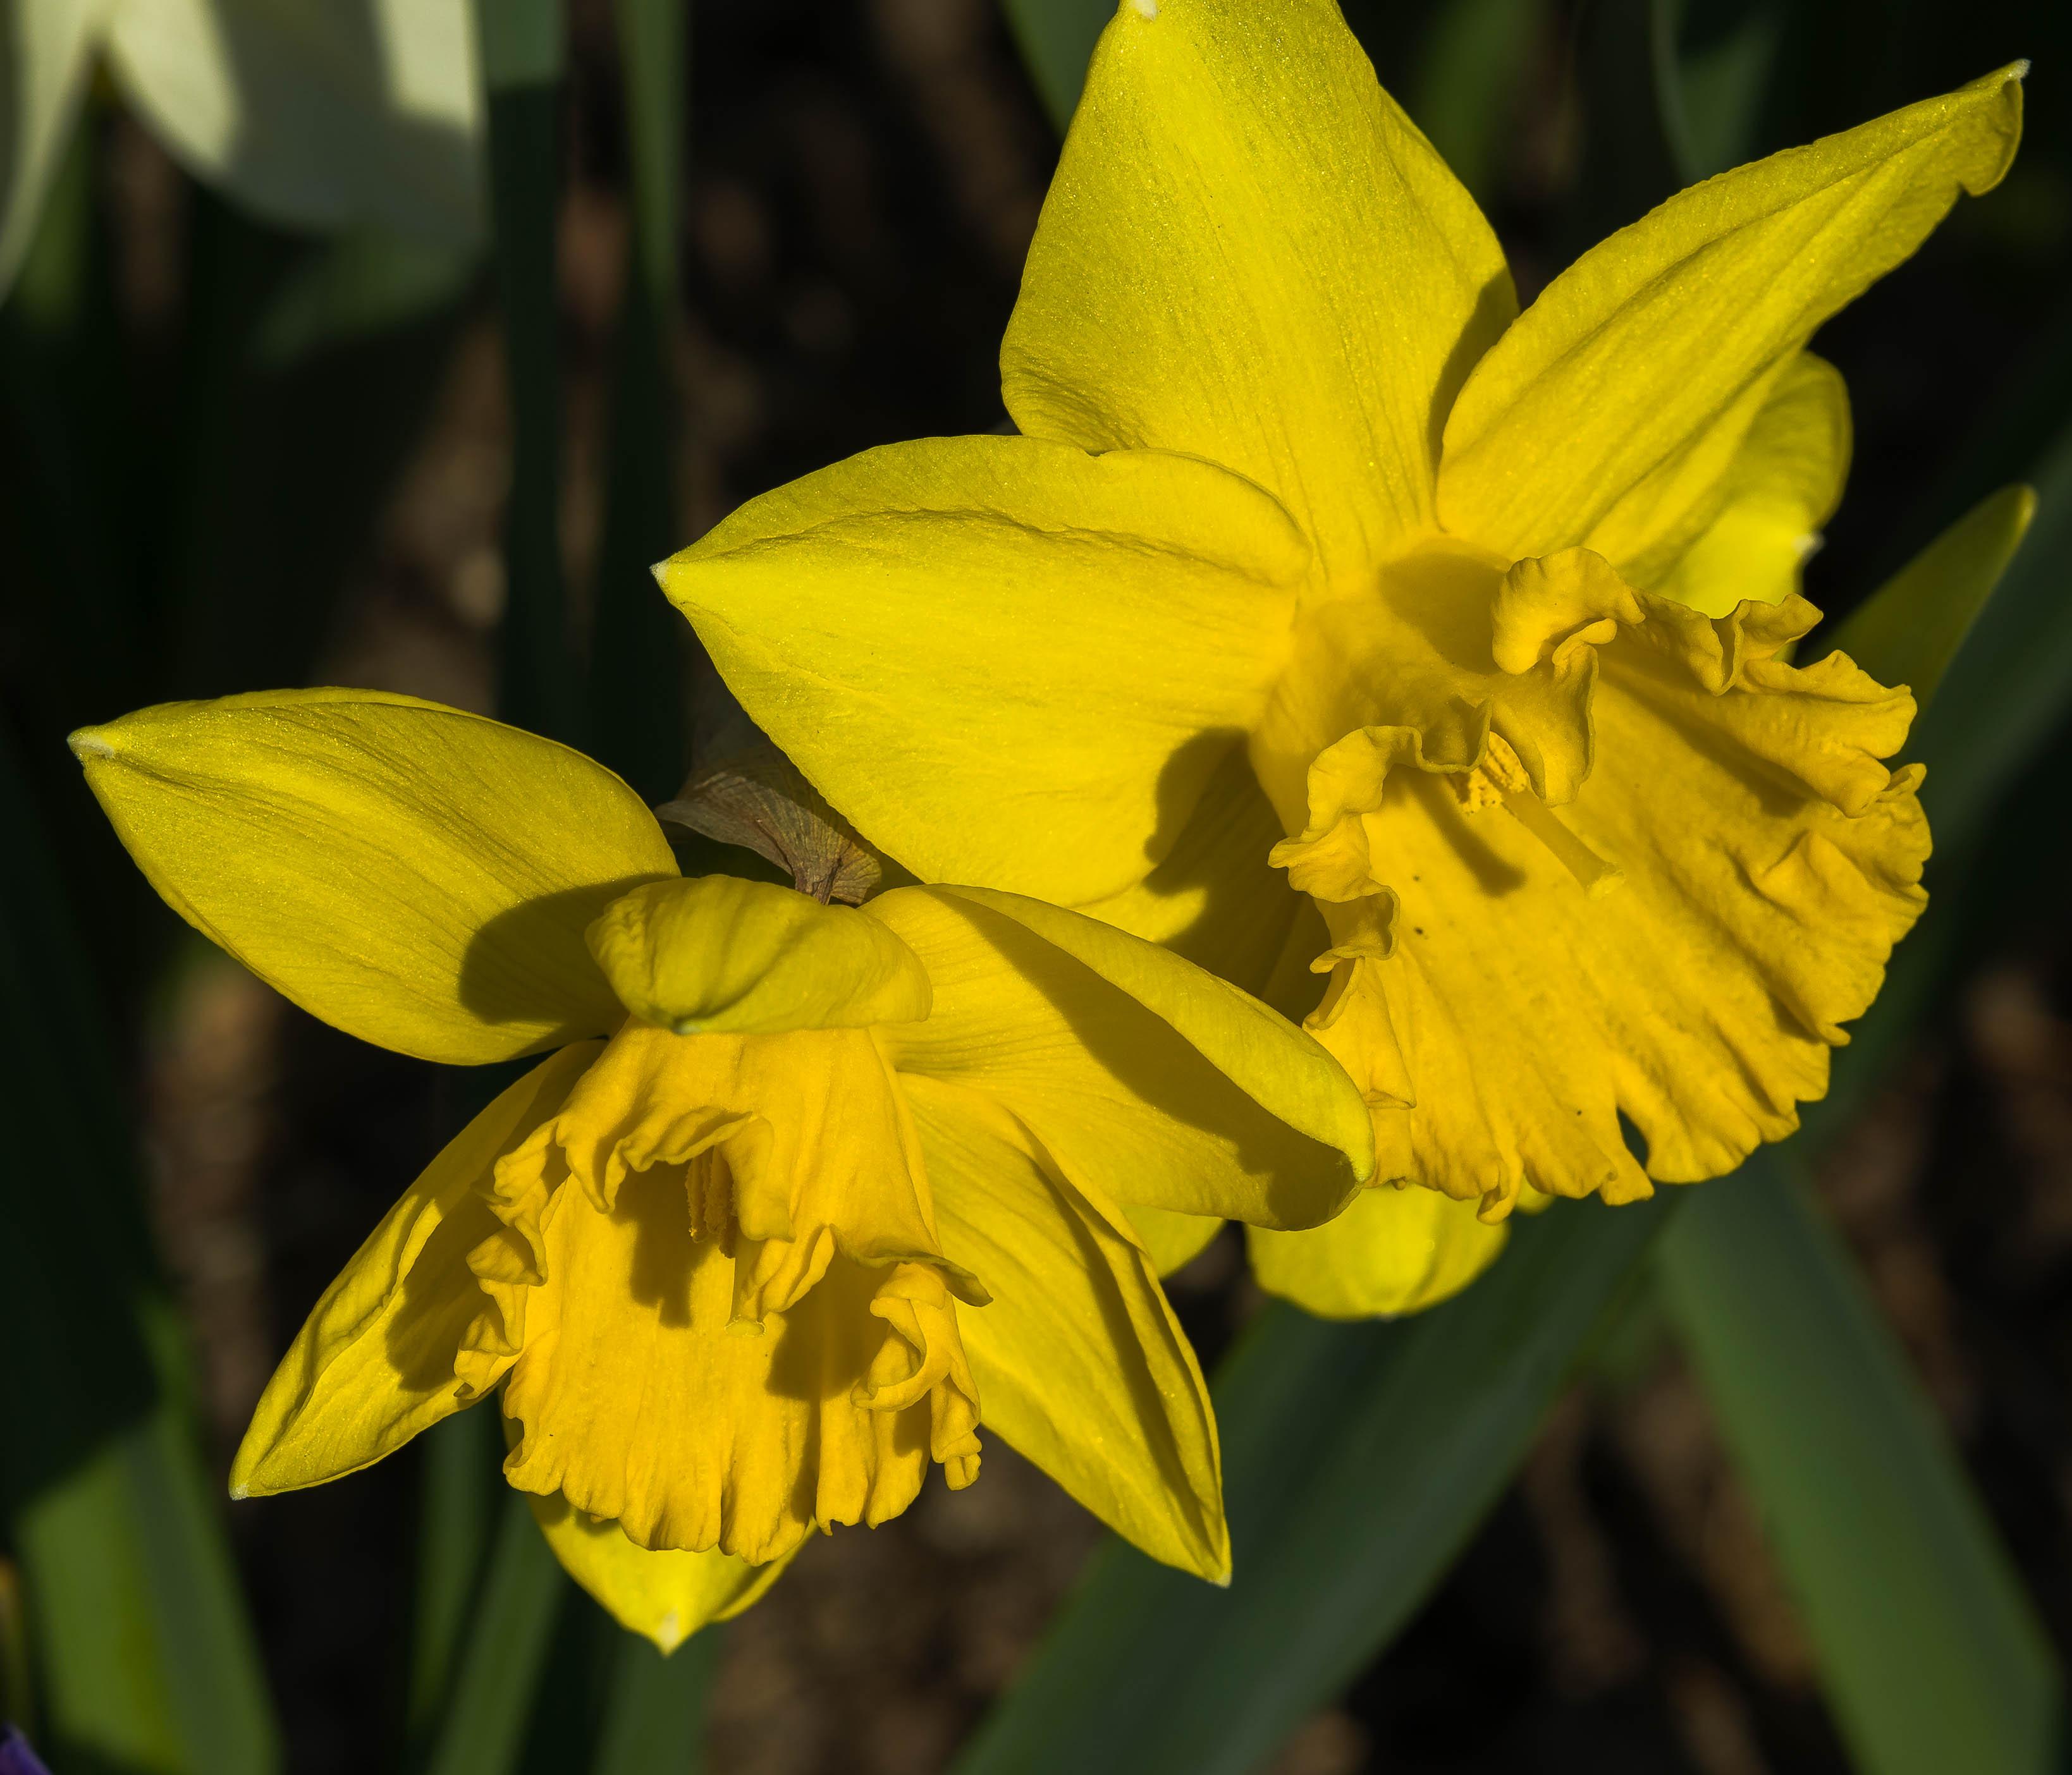 Two yellow daffodils, Longwood Gardens, April,2018